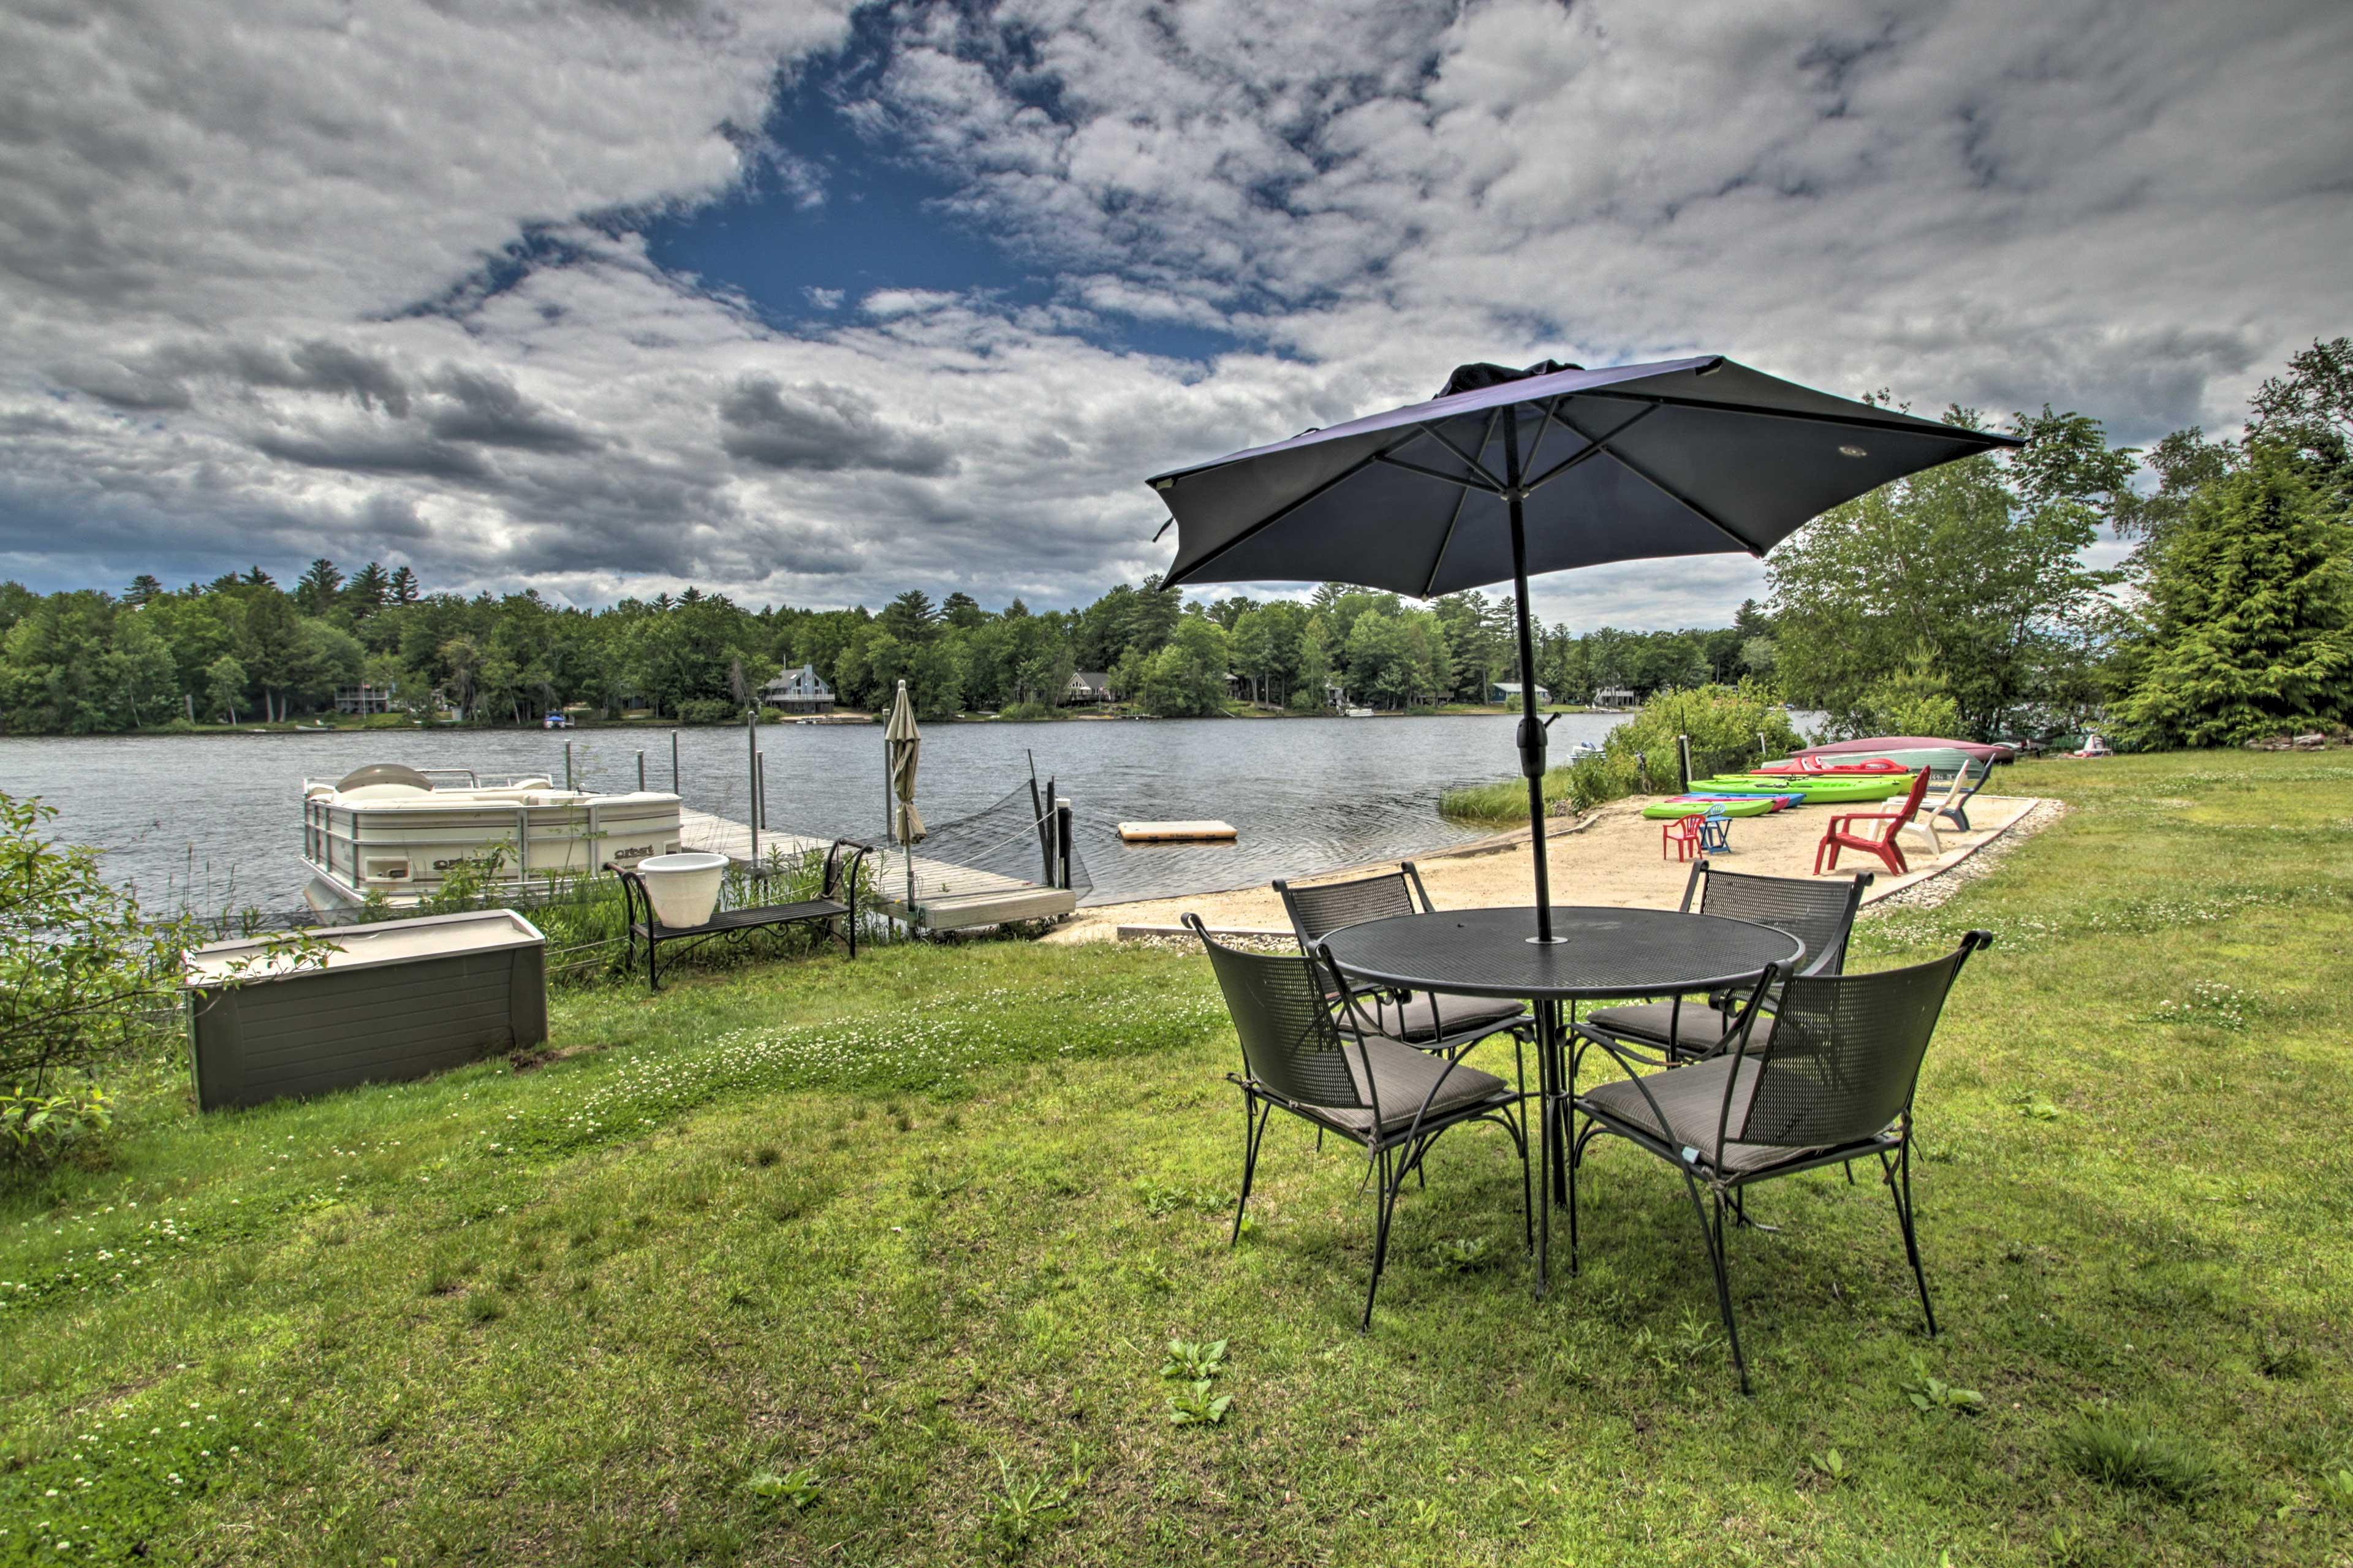 A lakeside getaway awaits at this Barnstead vacation rental home!